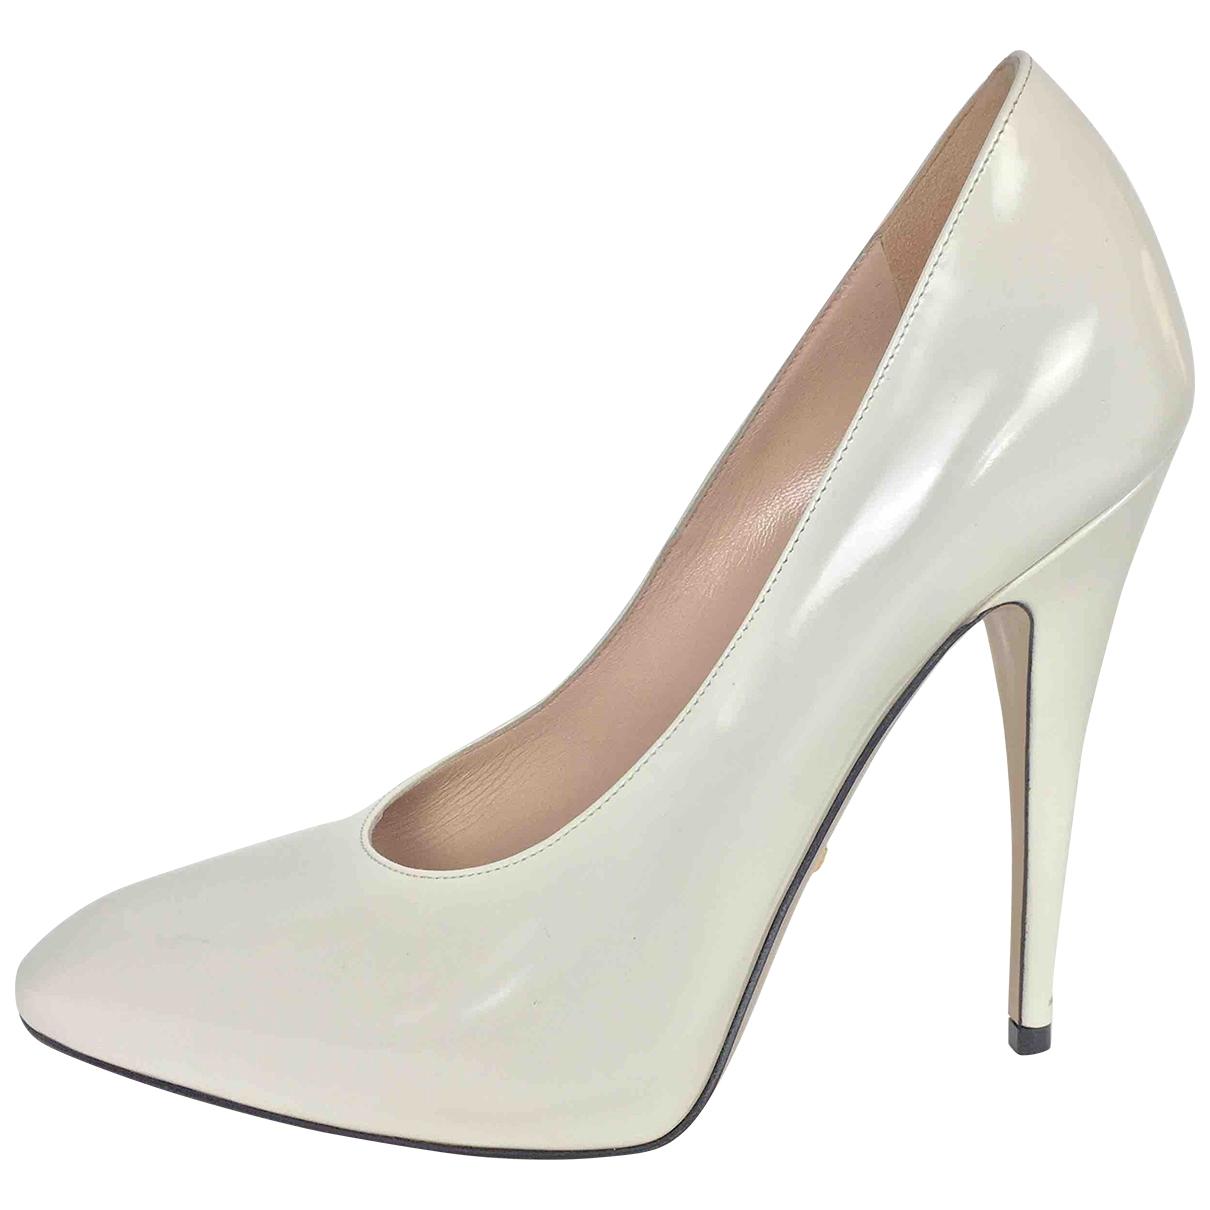 Gucci \N White Leather Heels for Women 38.5 EU